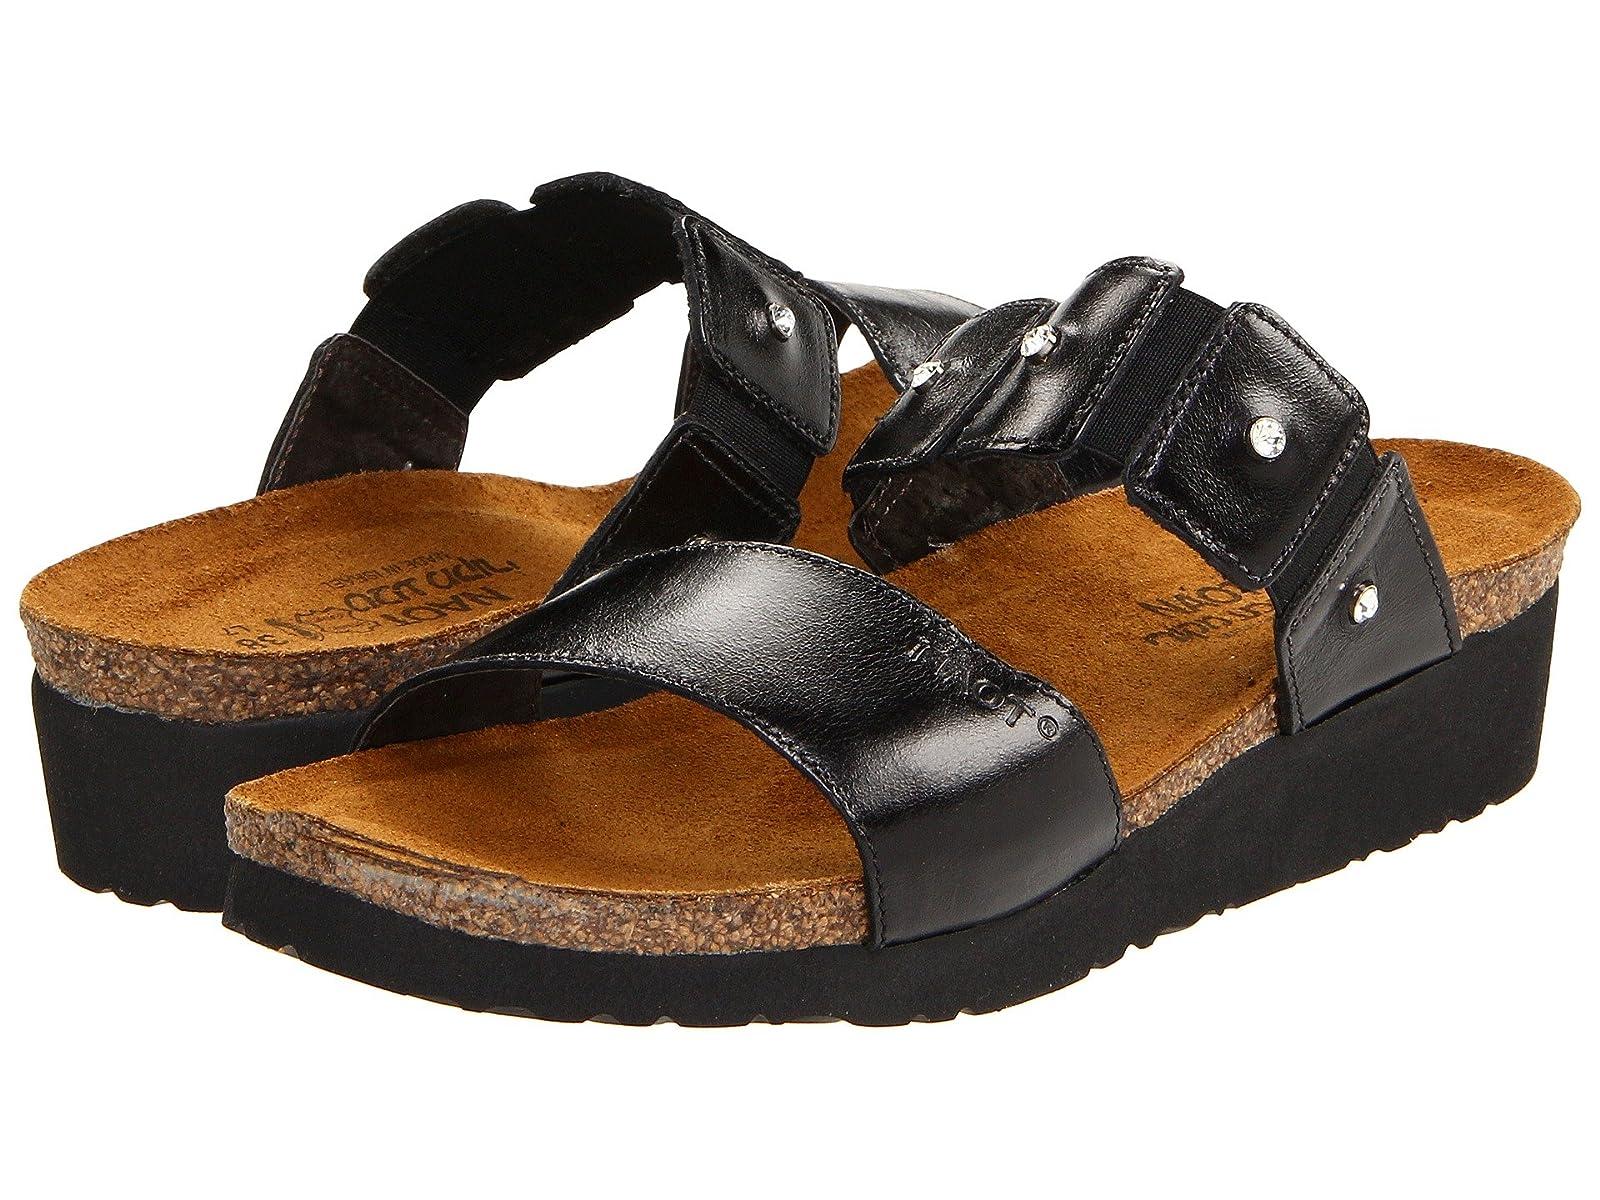 Naot AshleyAtmospheric grades have affordable shoes